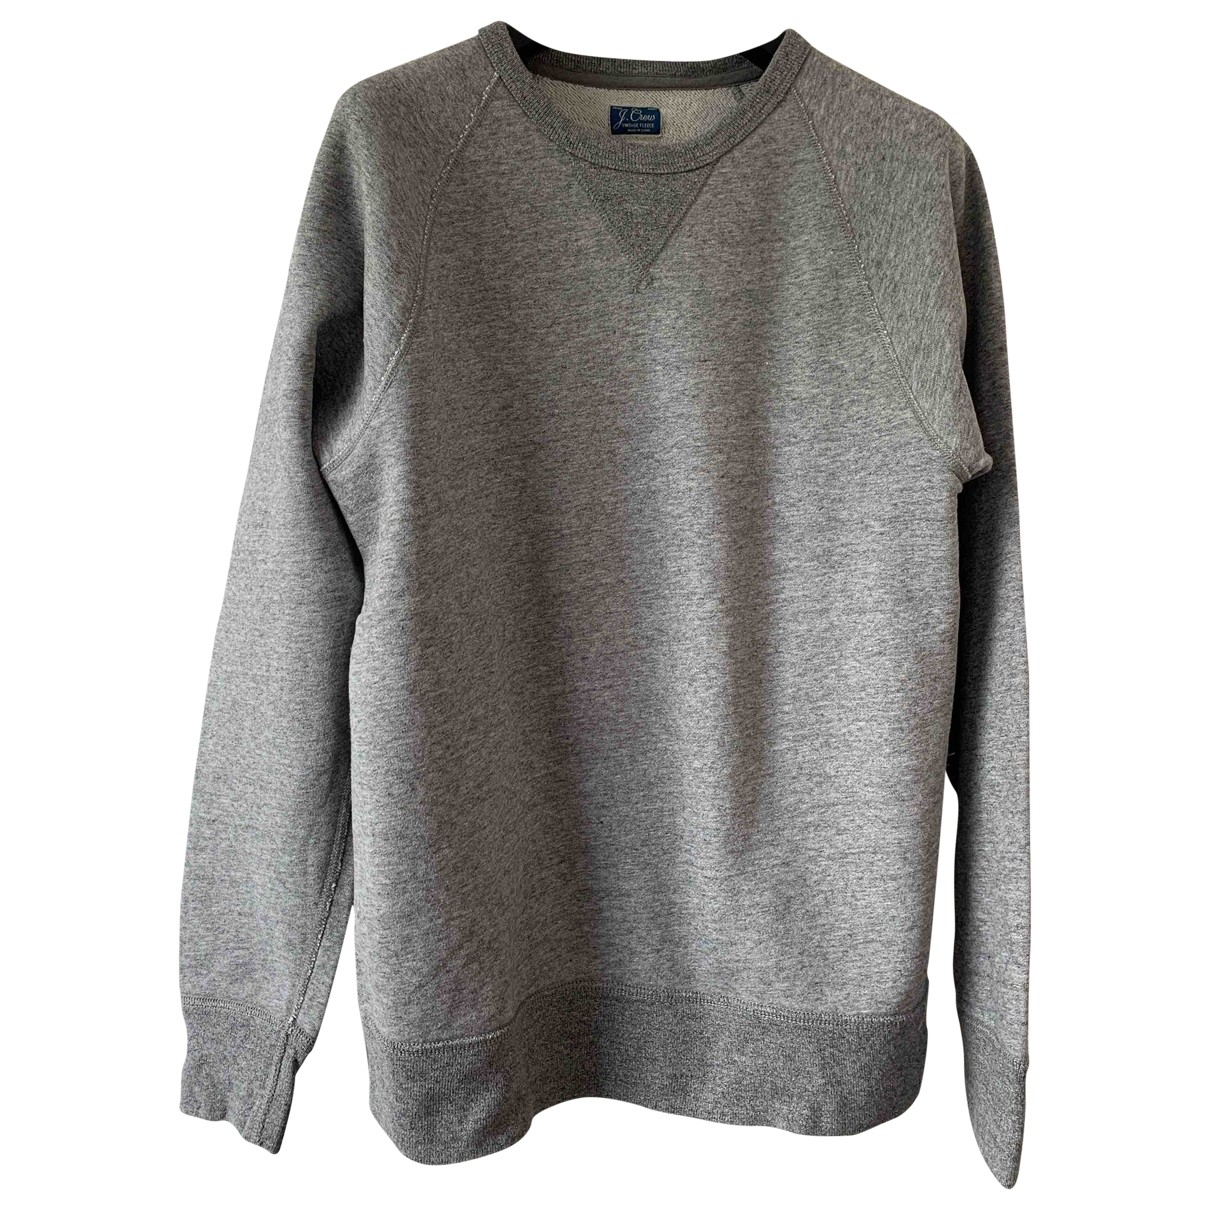 J.crew \N Grey Cotton Knitwear & Sweatshirts for Men S International